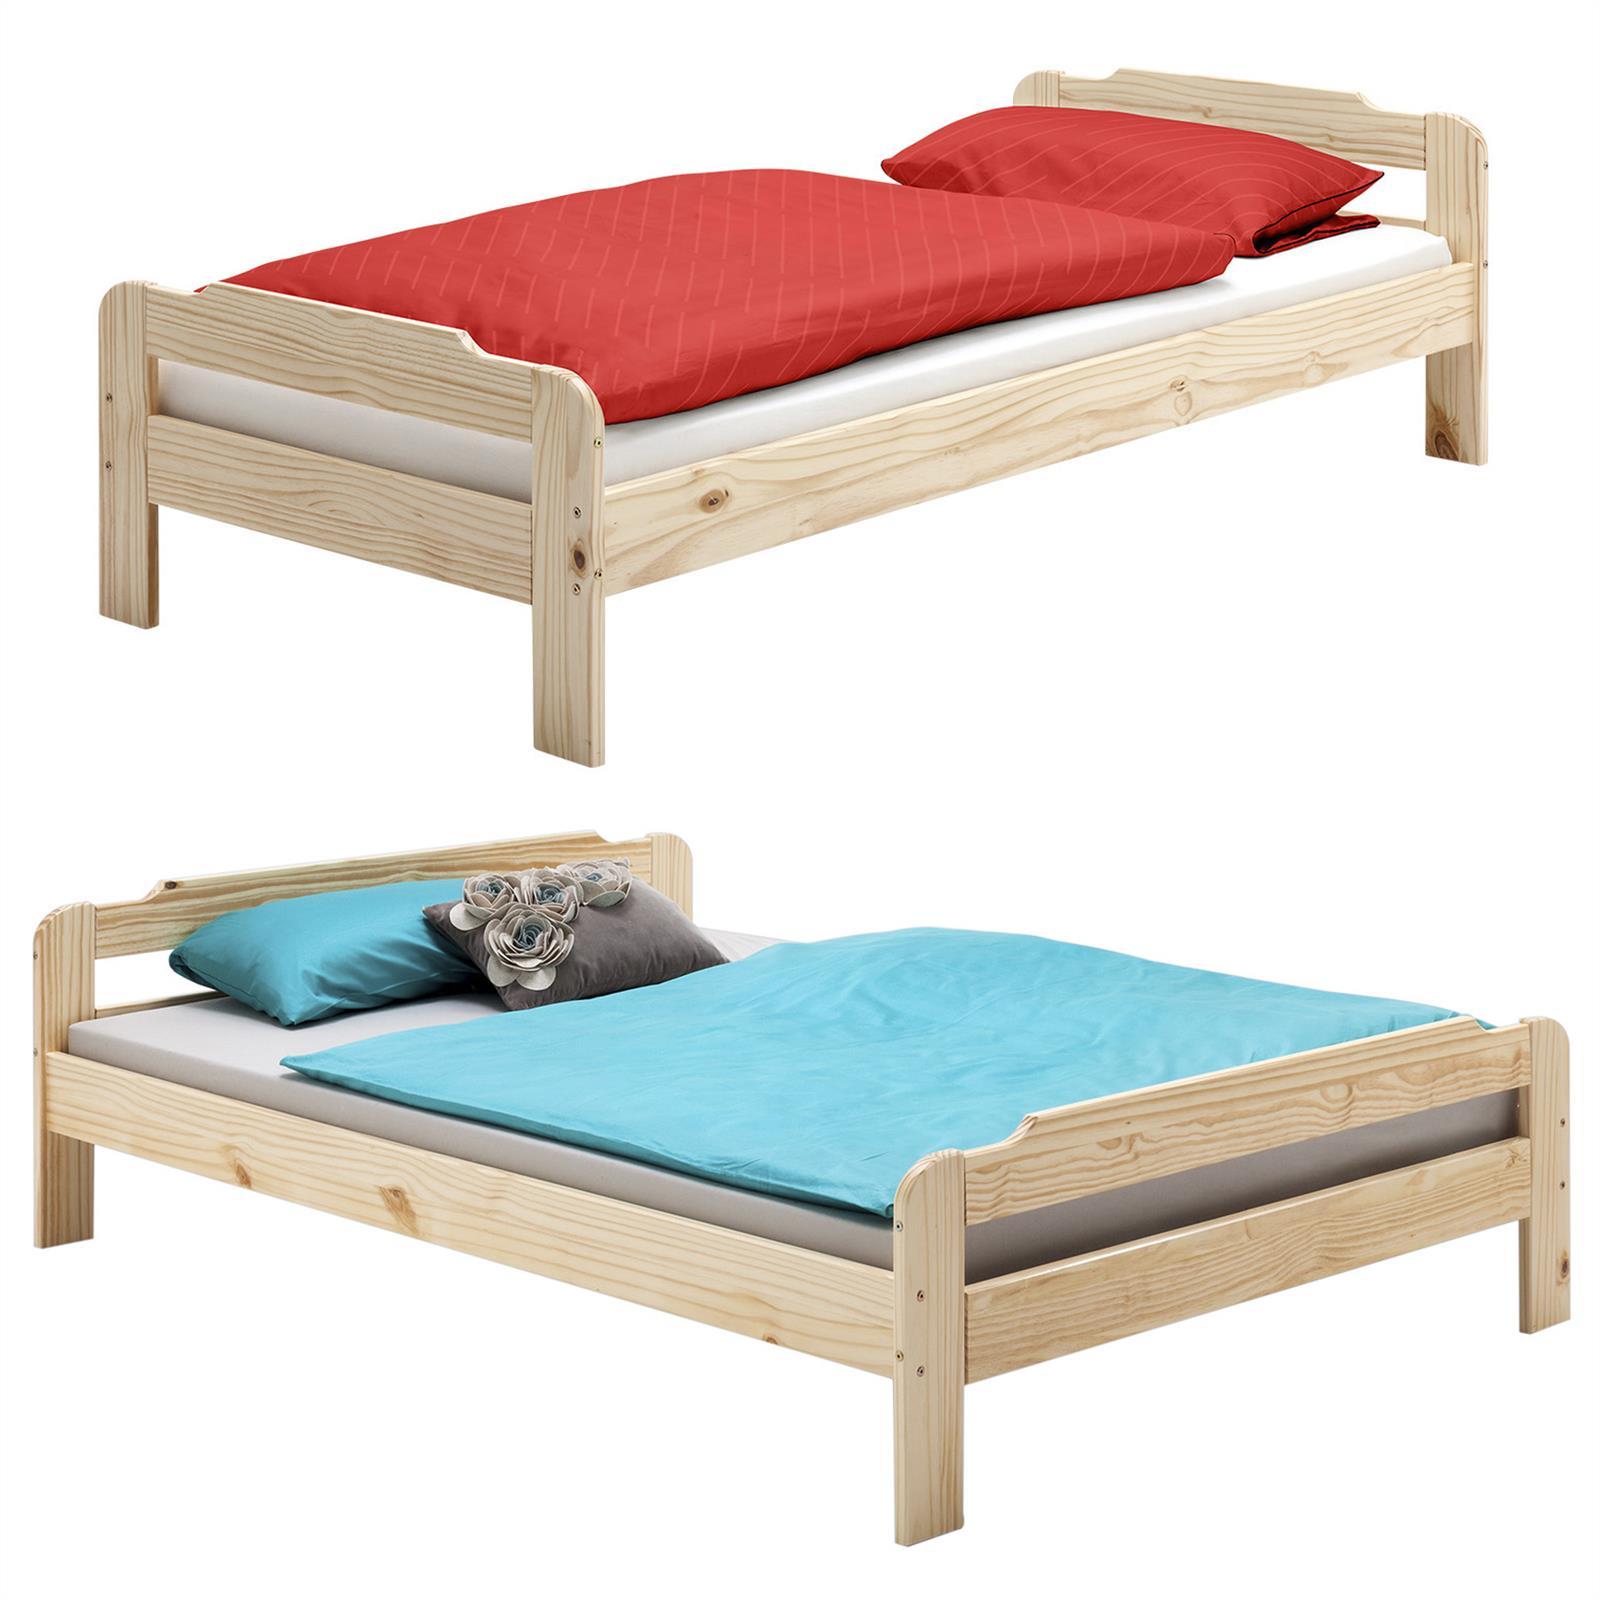 lit en pin marco vernis naturel 4 tailles disponibles mobil meubles. Black Bedroom Furniture Sets. Home Design Ideas